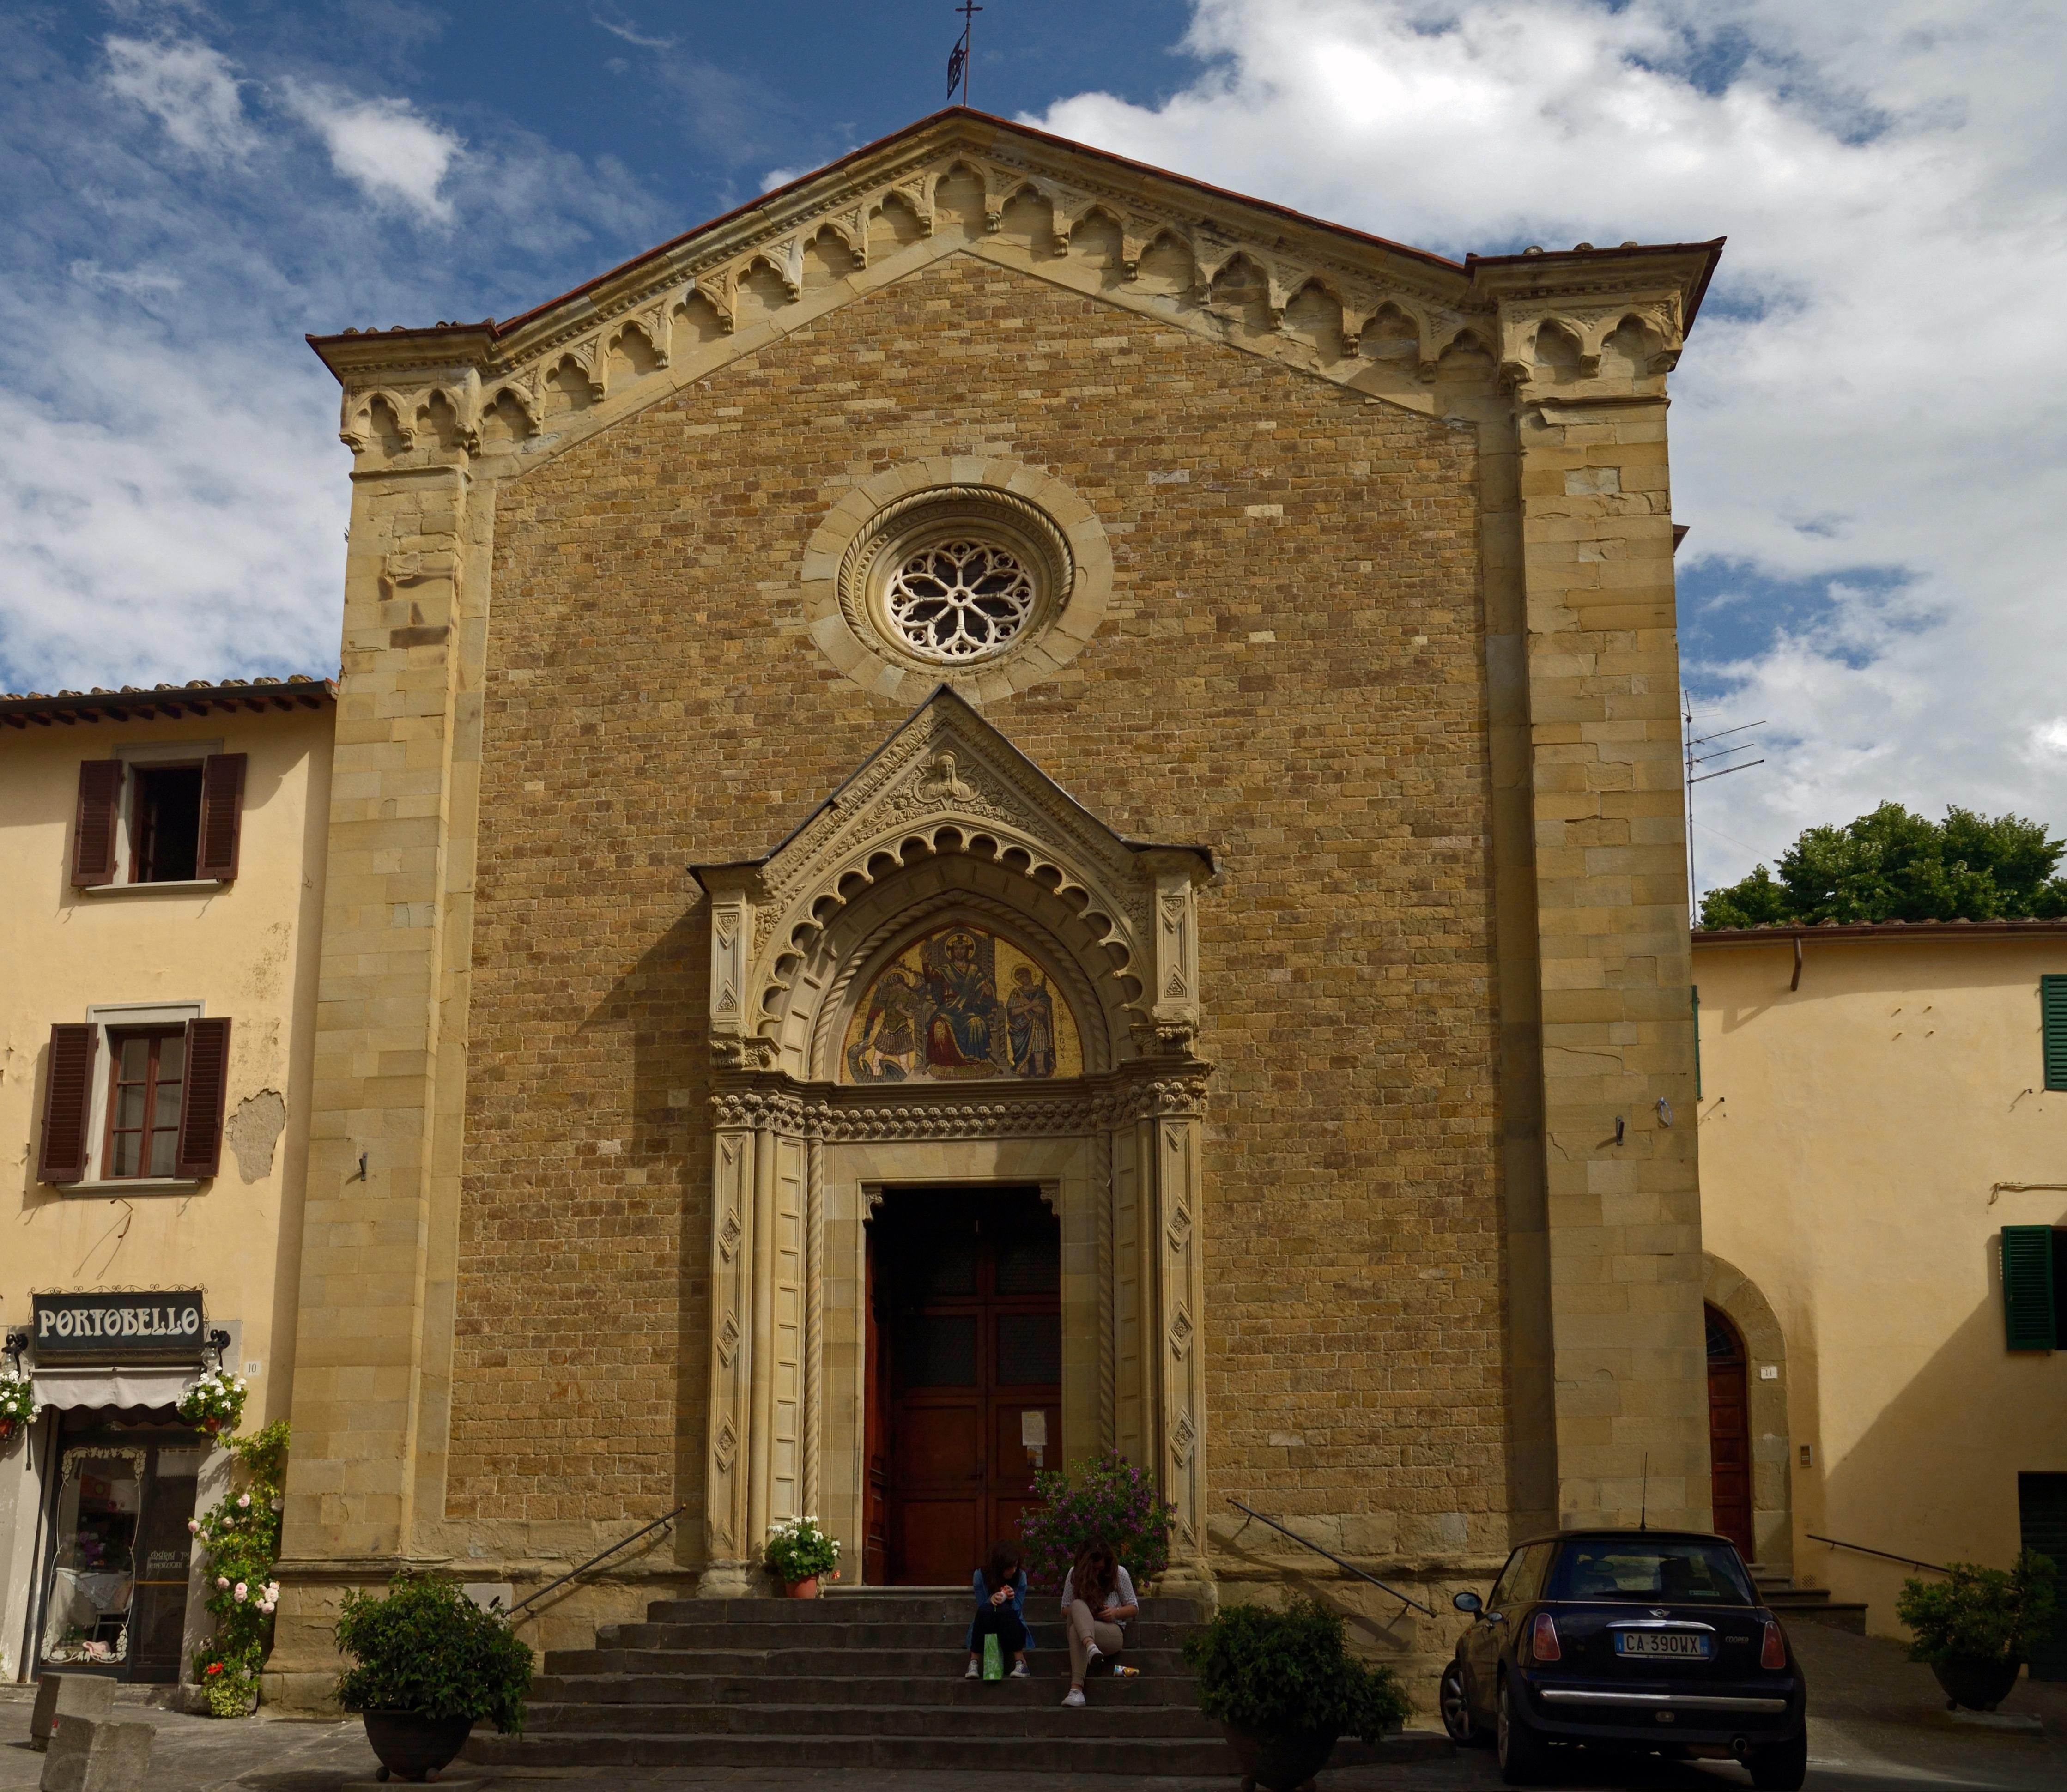 file church of san michele in arezzo. Black Bedroom Furniture Sets. Home Design Ideas